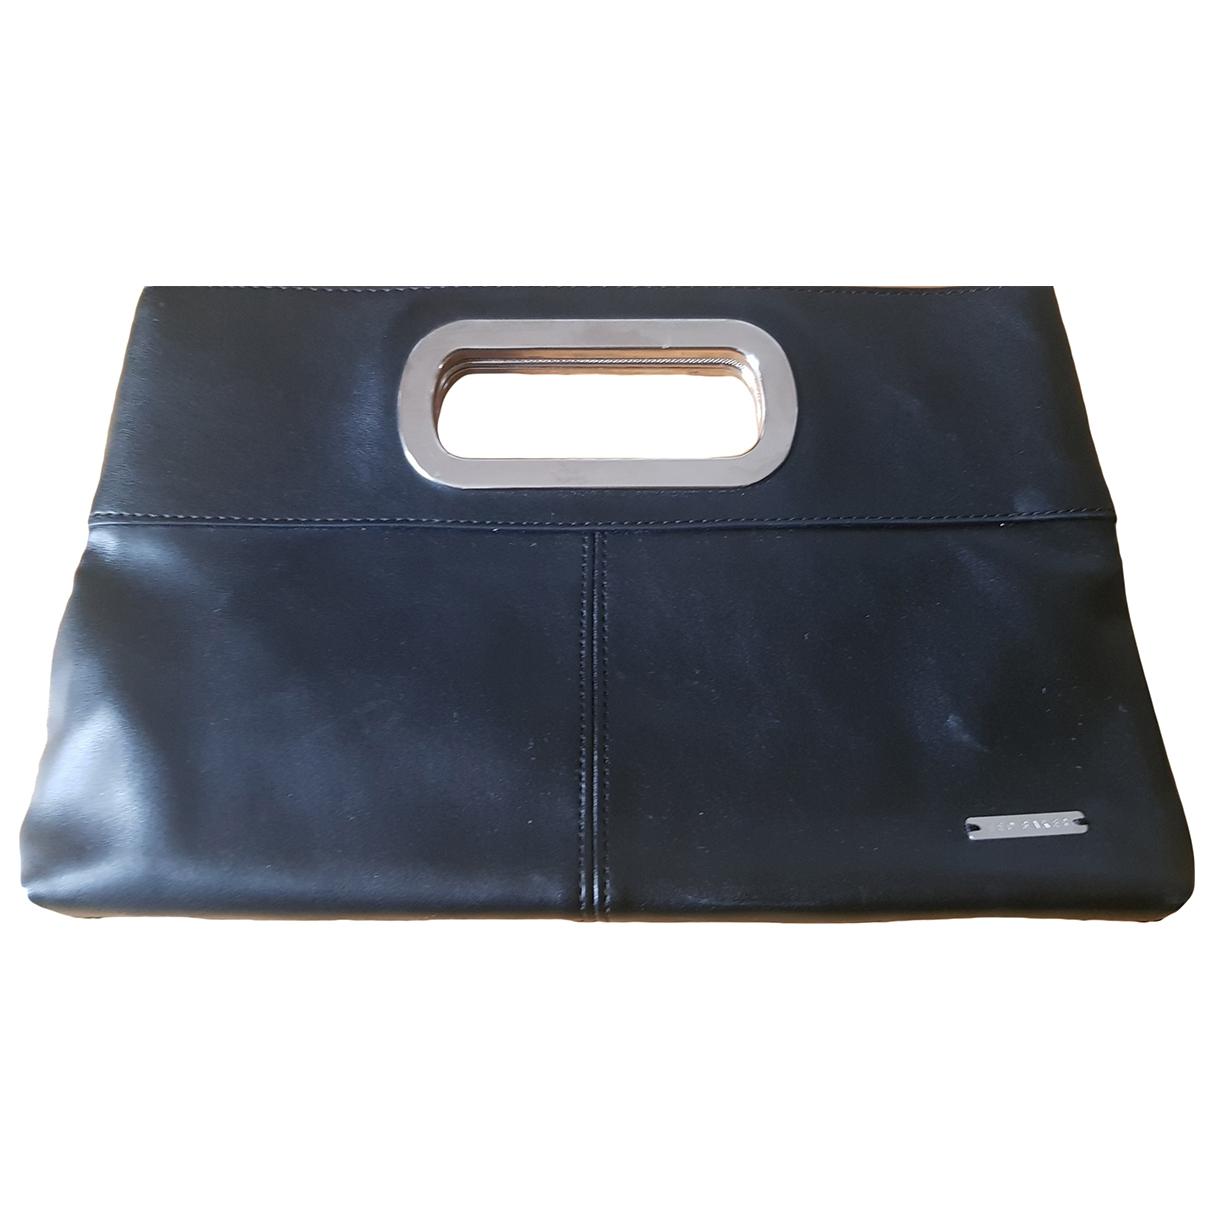 Ted Baker \N Black Clutch bag for Women \N